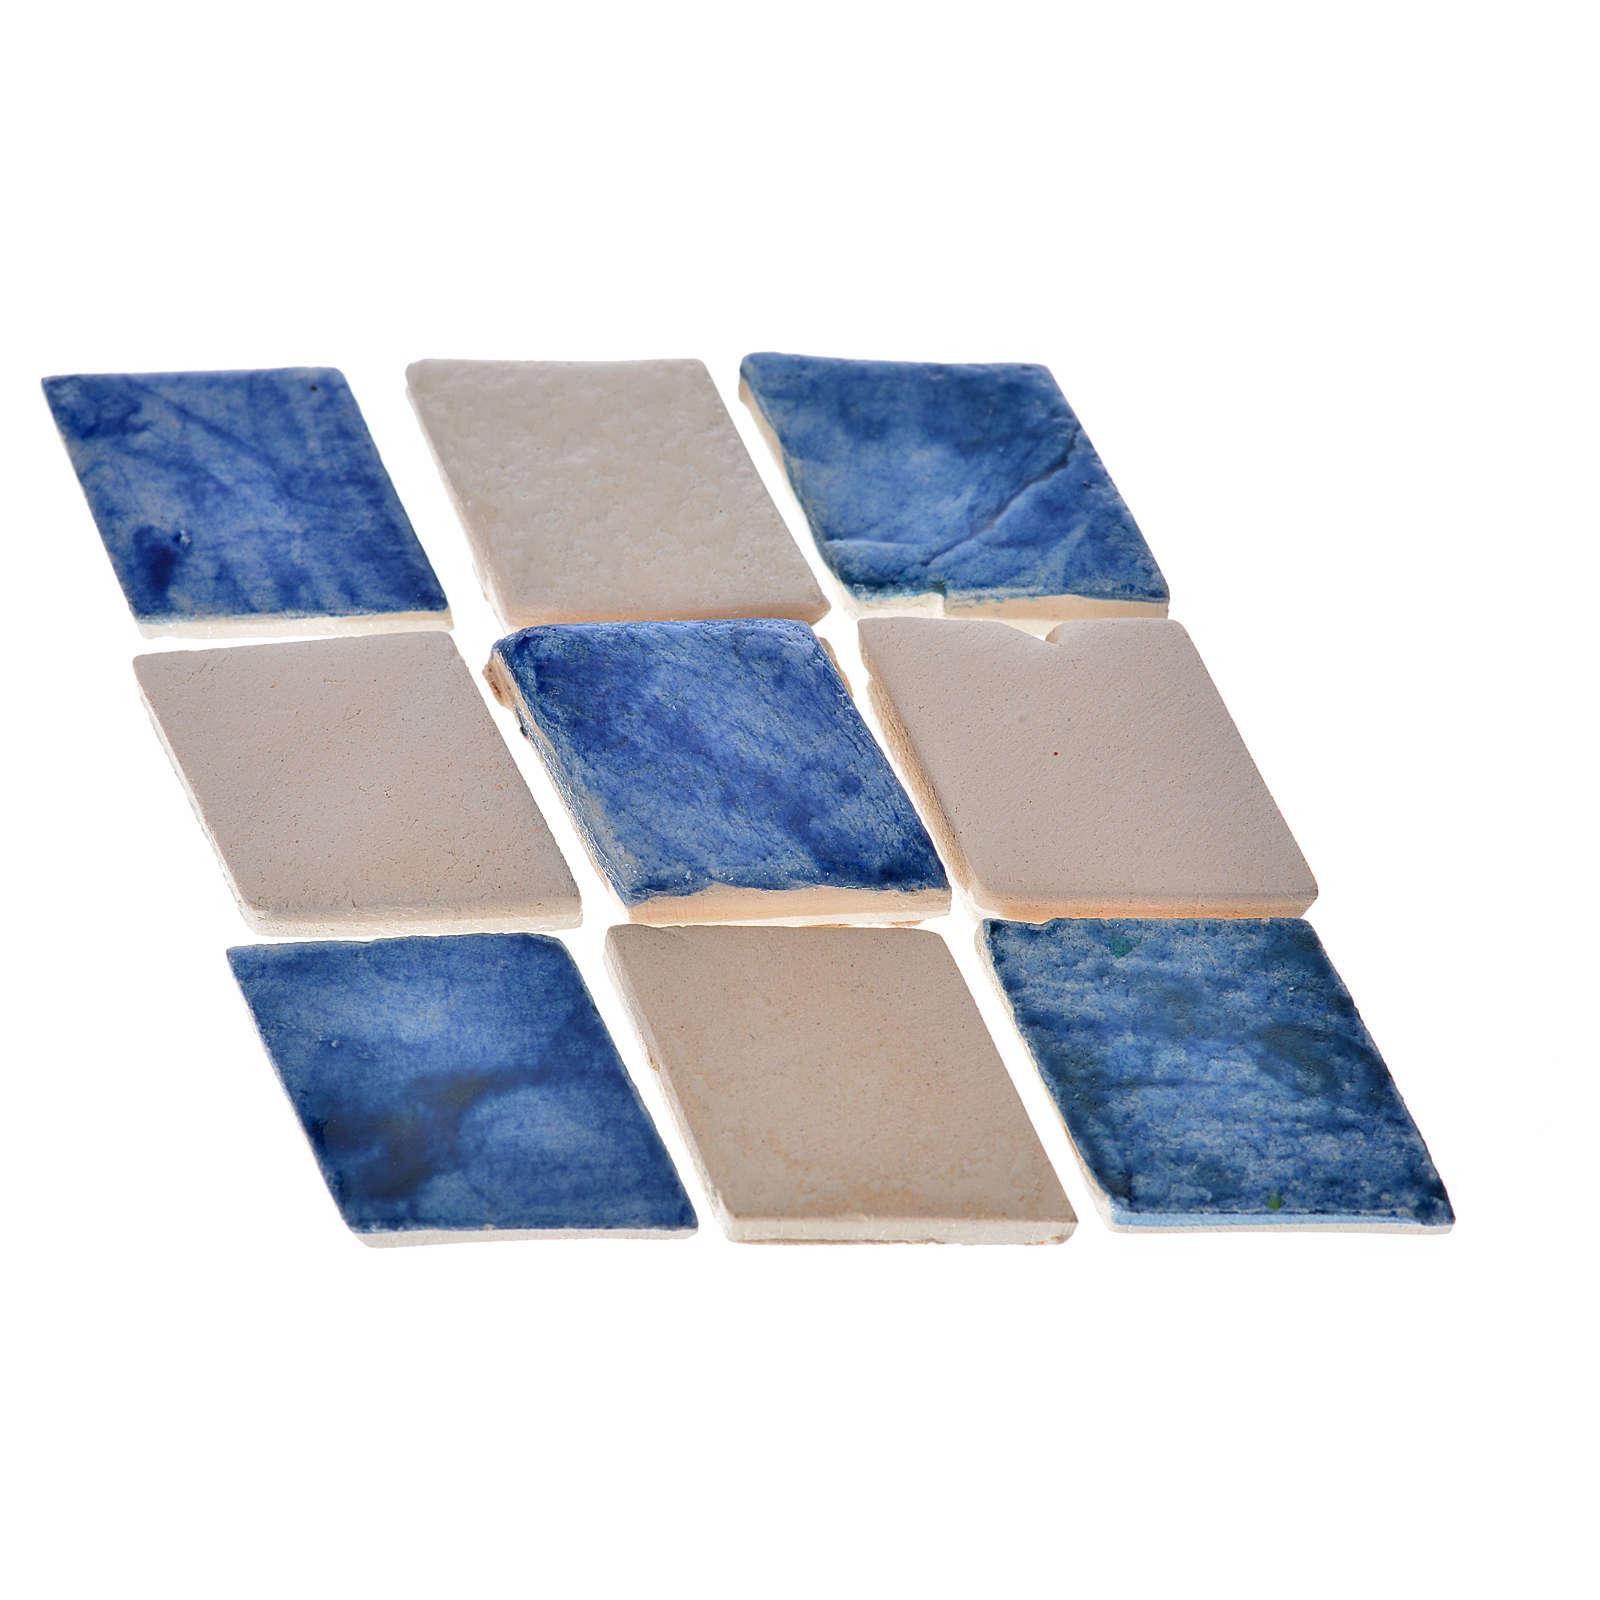 Mattonelle terracotta smaltate 60 pz romboidali blu per presepe 4